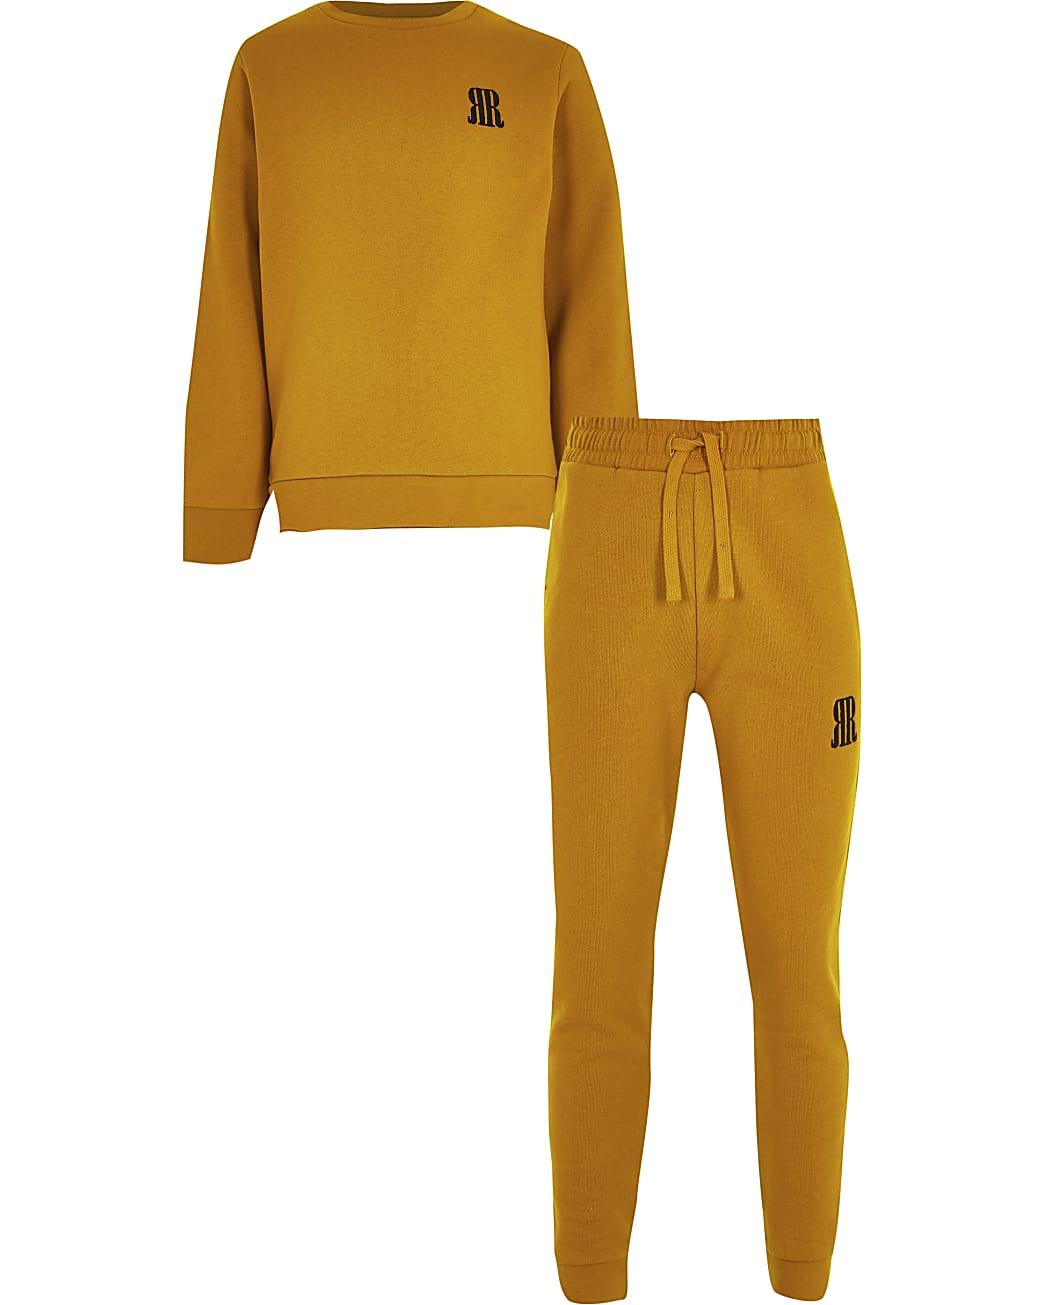 Boys yellow sweatshirt outfit